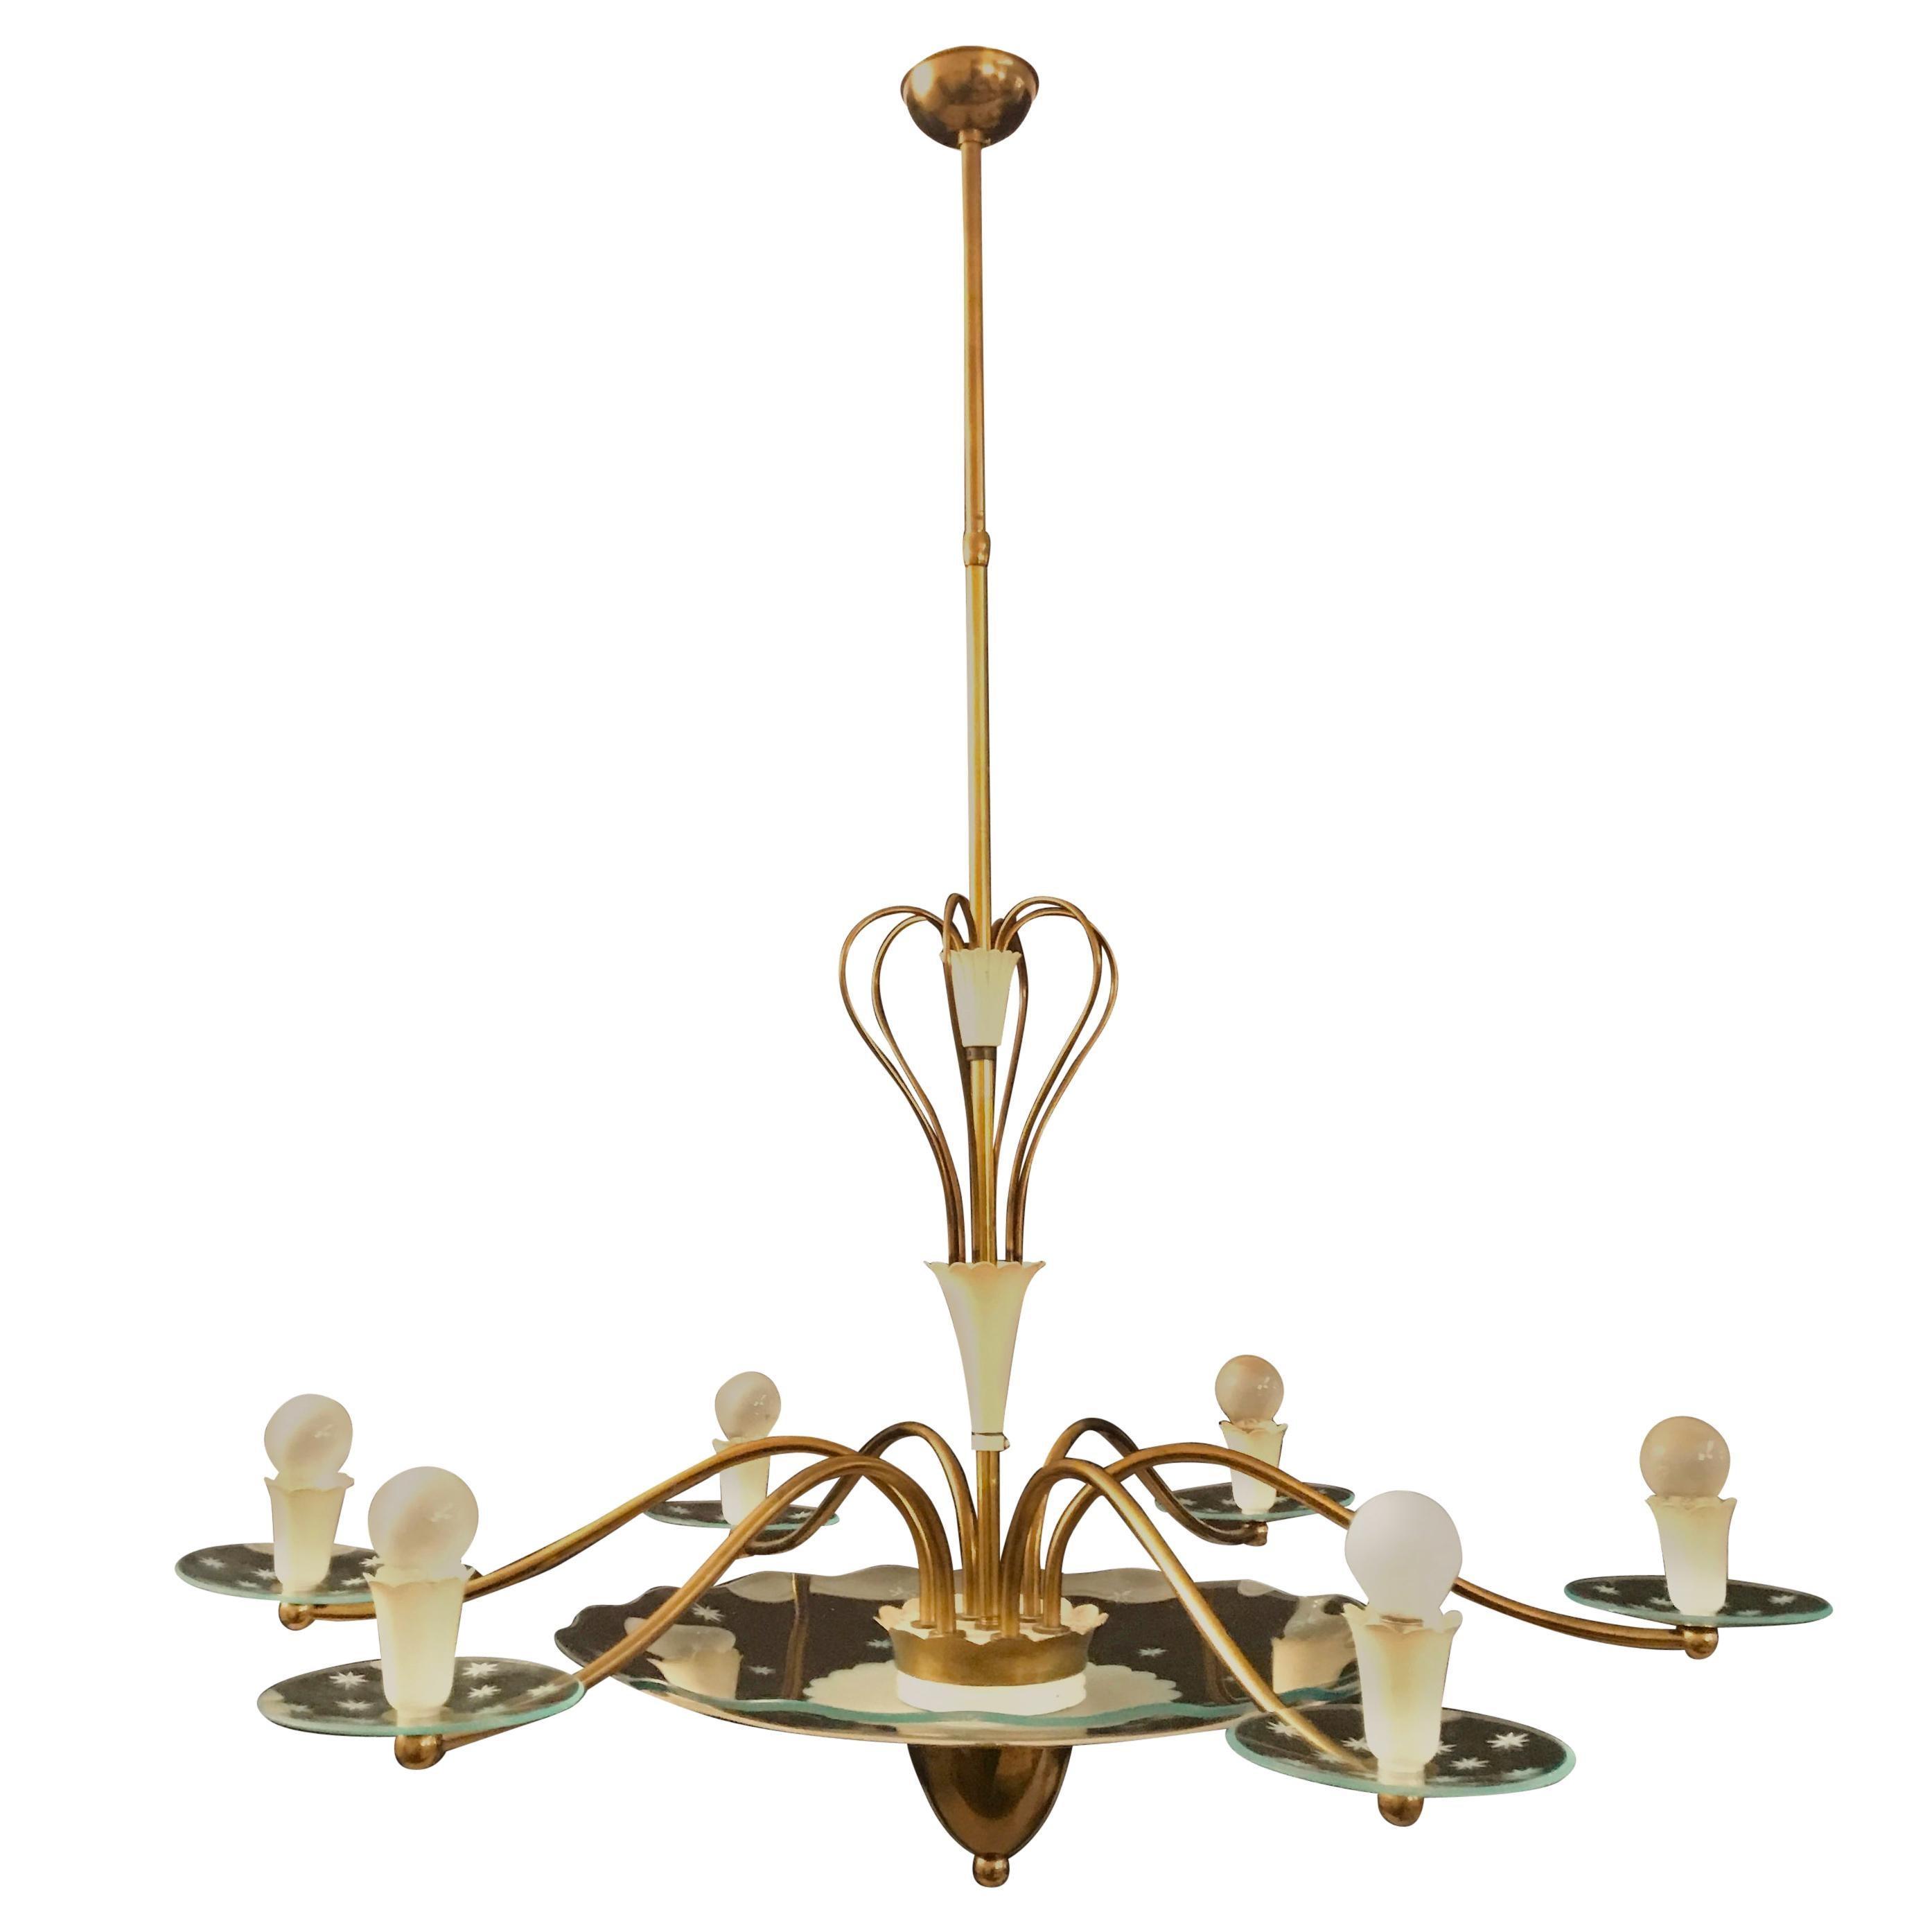 1940s Elegant Italian Chandelier, Pietro Chiesa Style for Fontana Arte